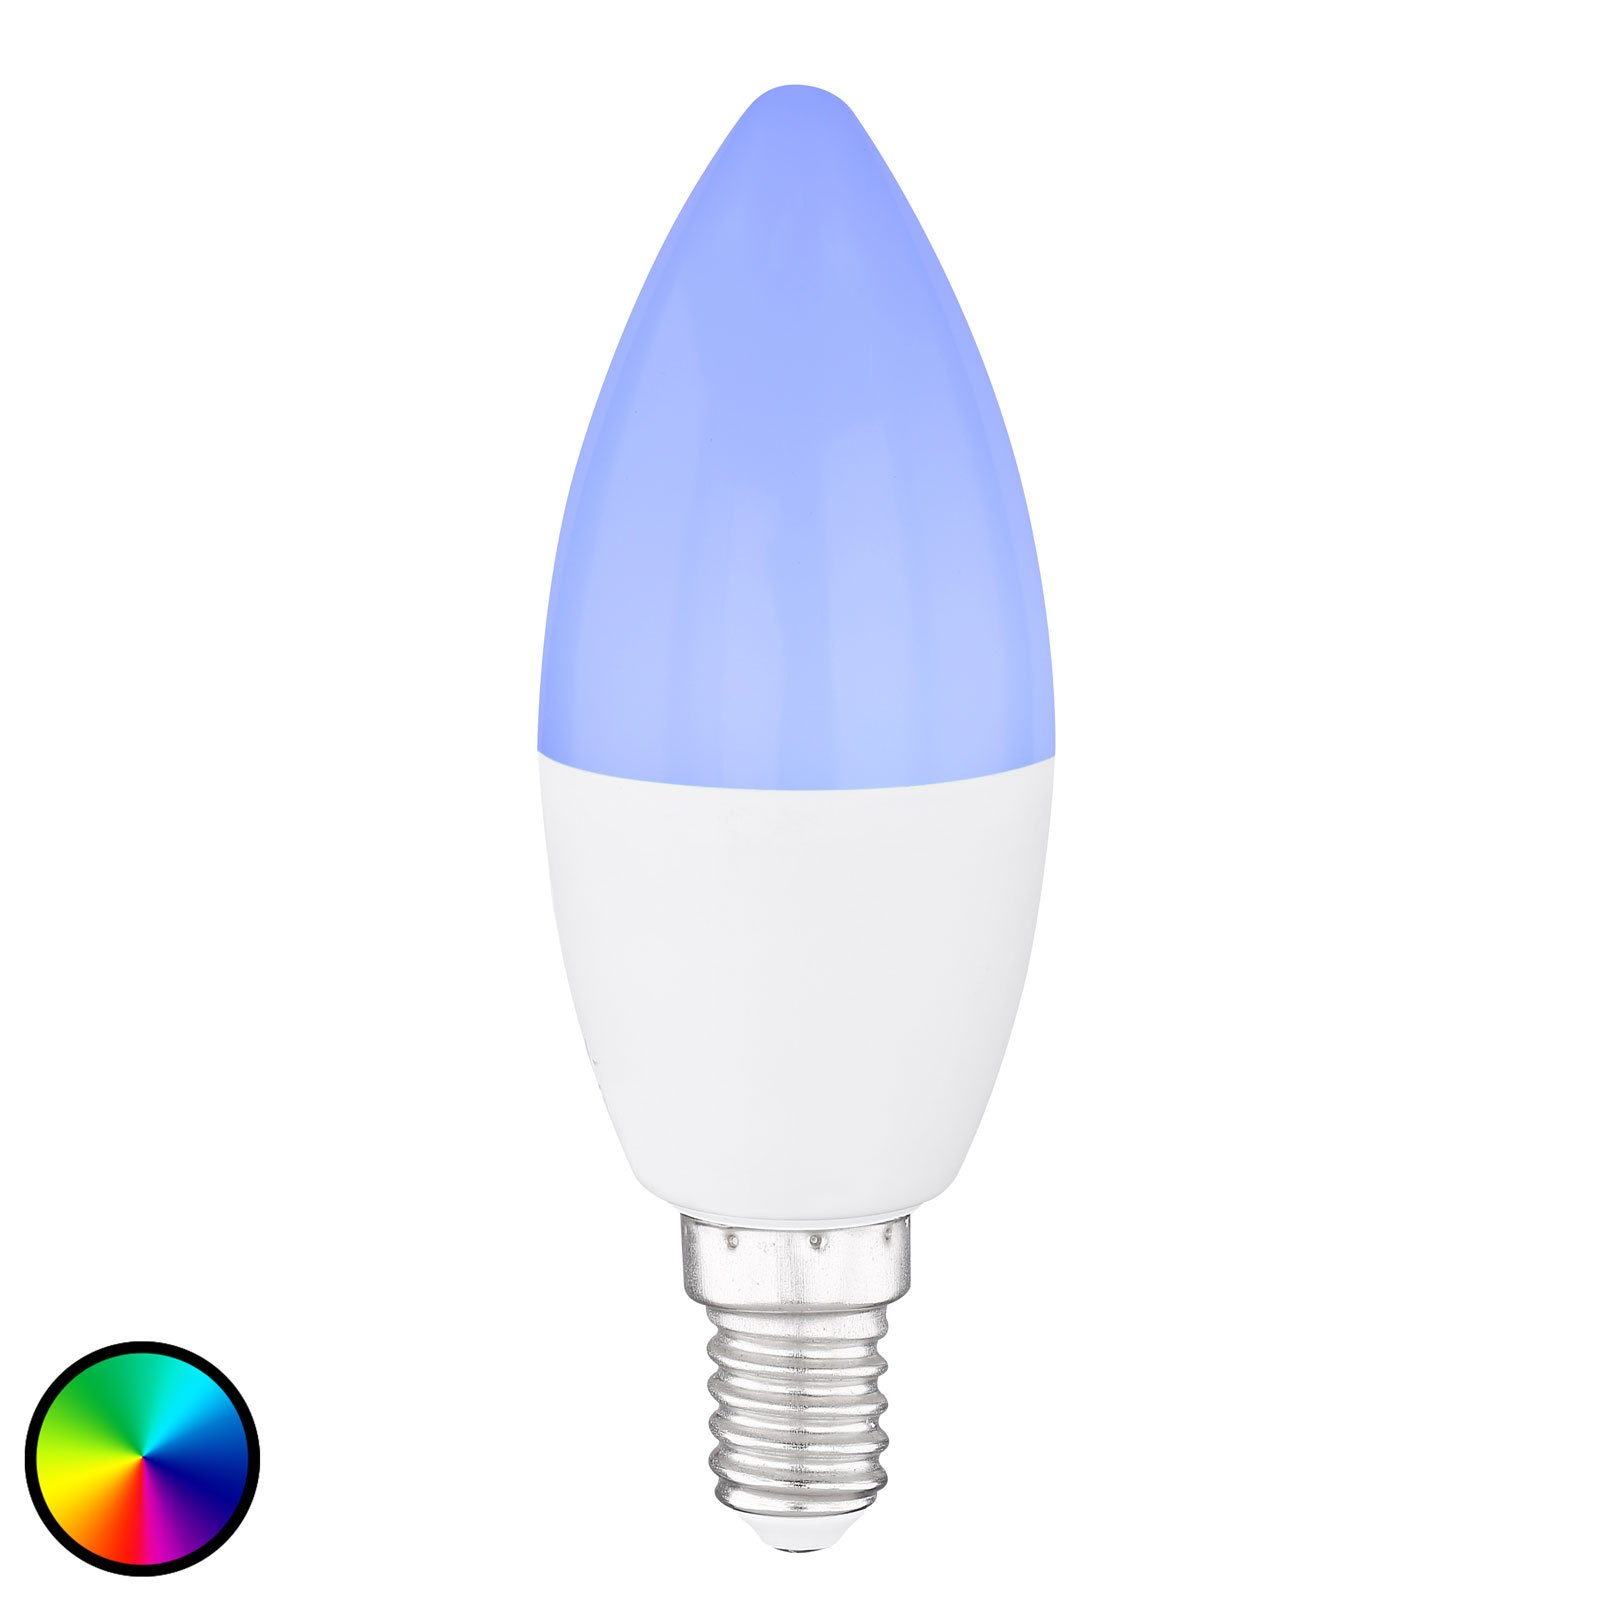 Ampoule flamme LED E14, 4,5W Tuya-Smart RGBW CCT